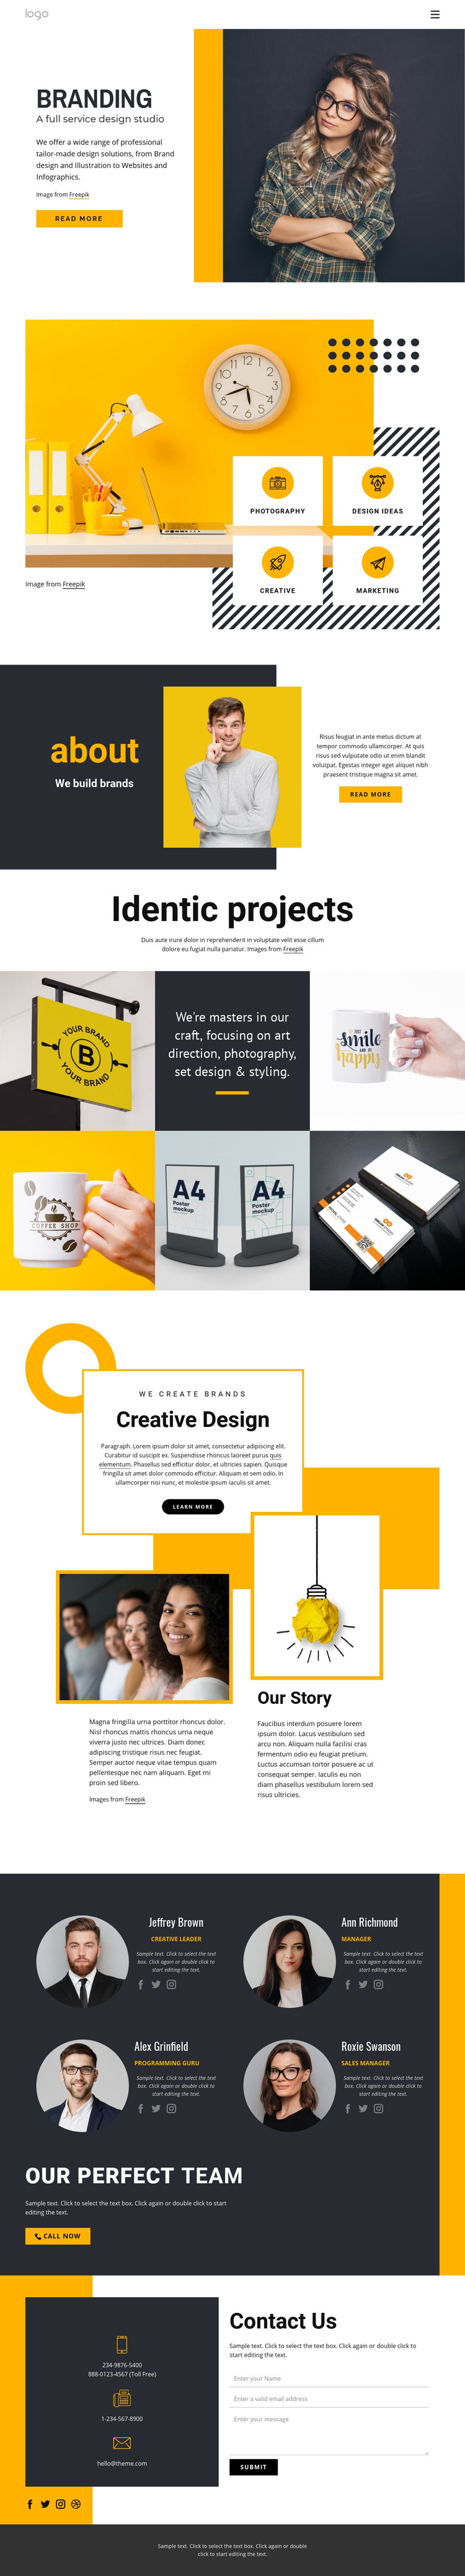 Full-service design studio Homepage Design